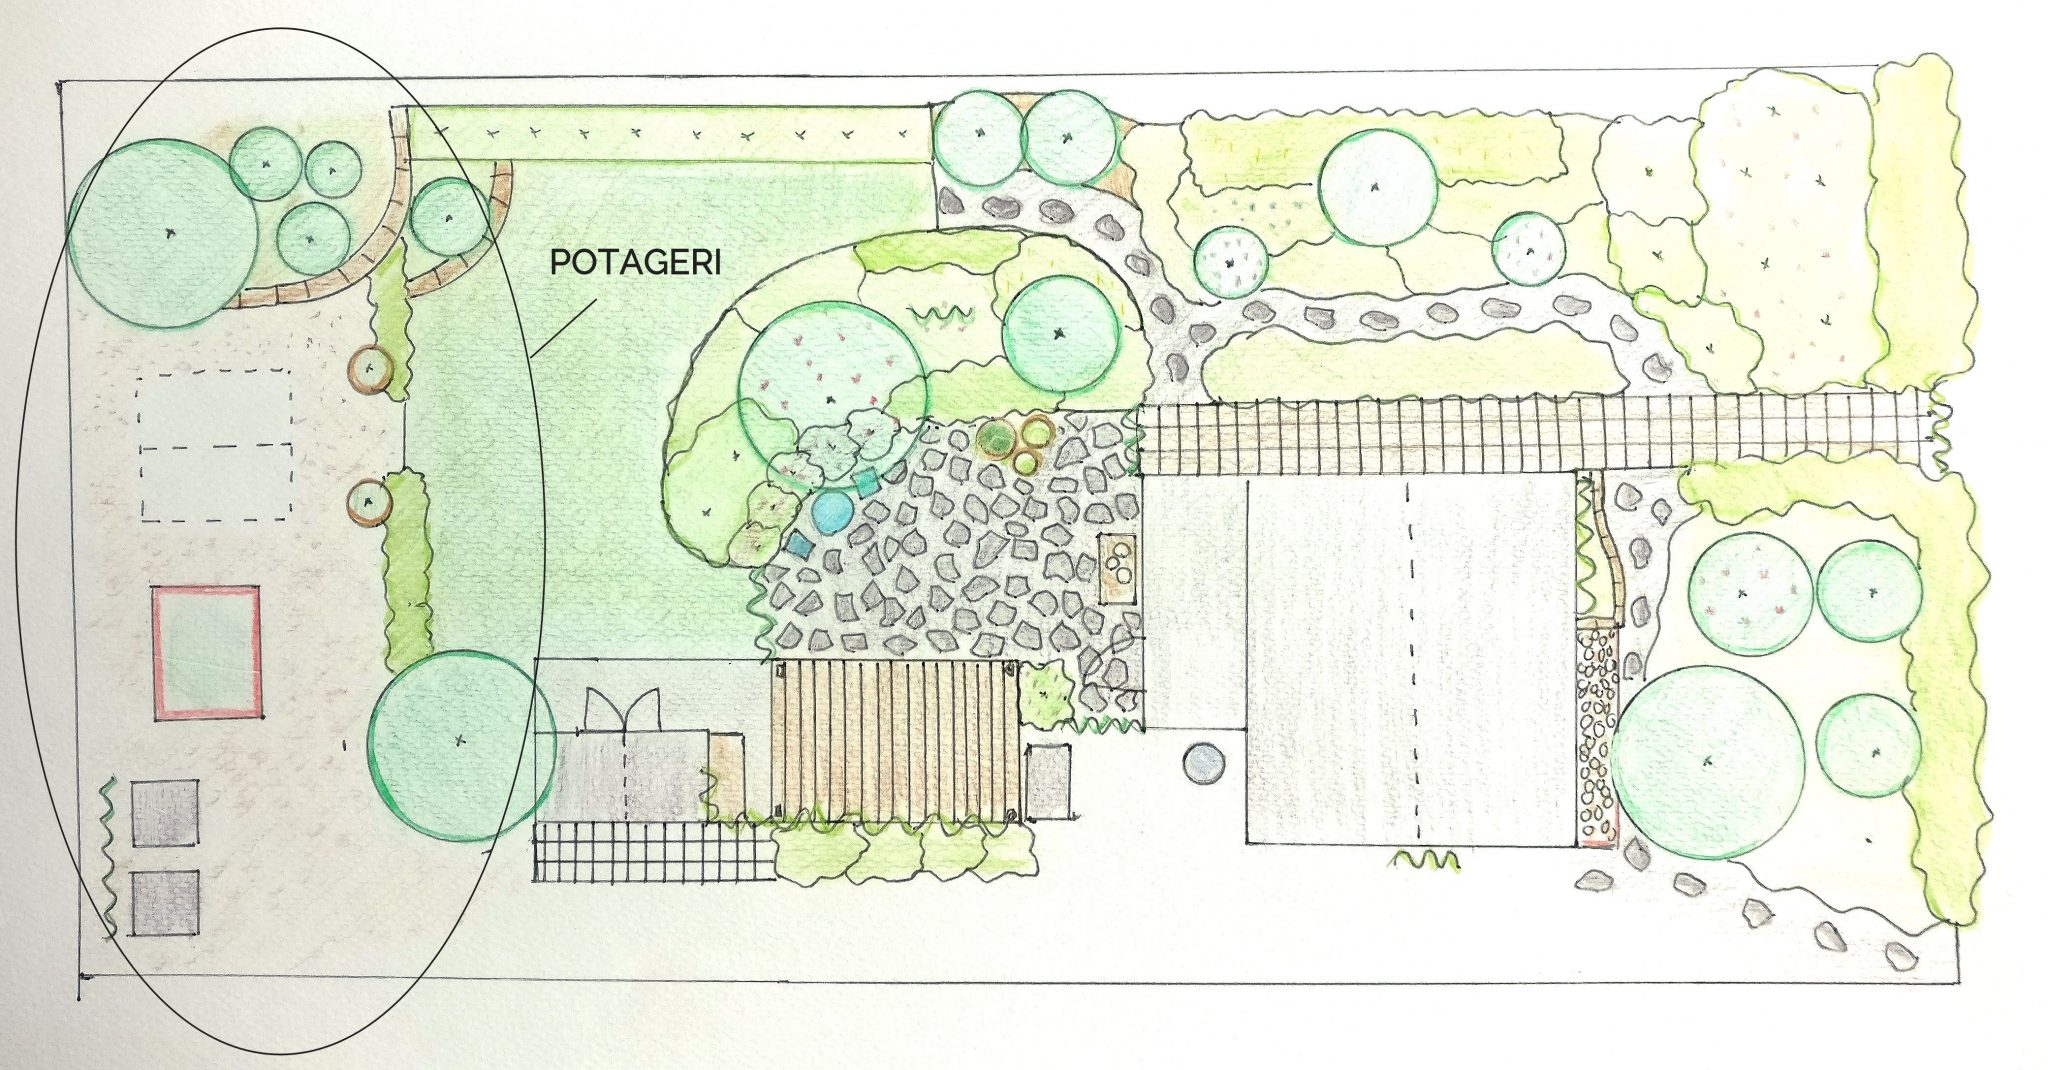 Puutarhasuunnitelma siirtolapuutarhapalstalle.